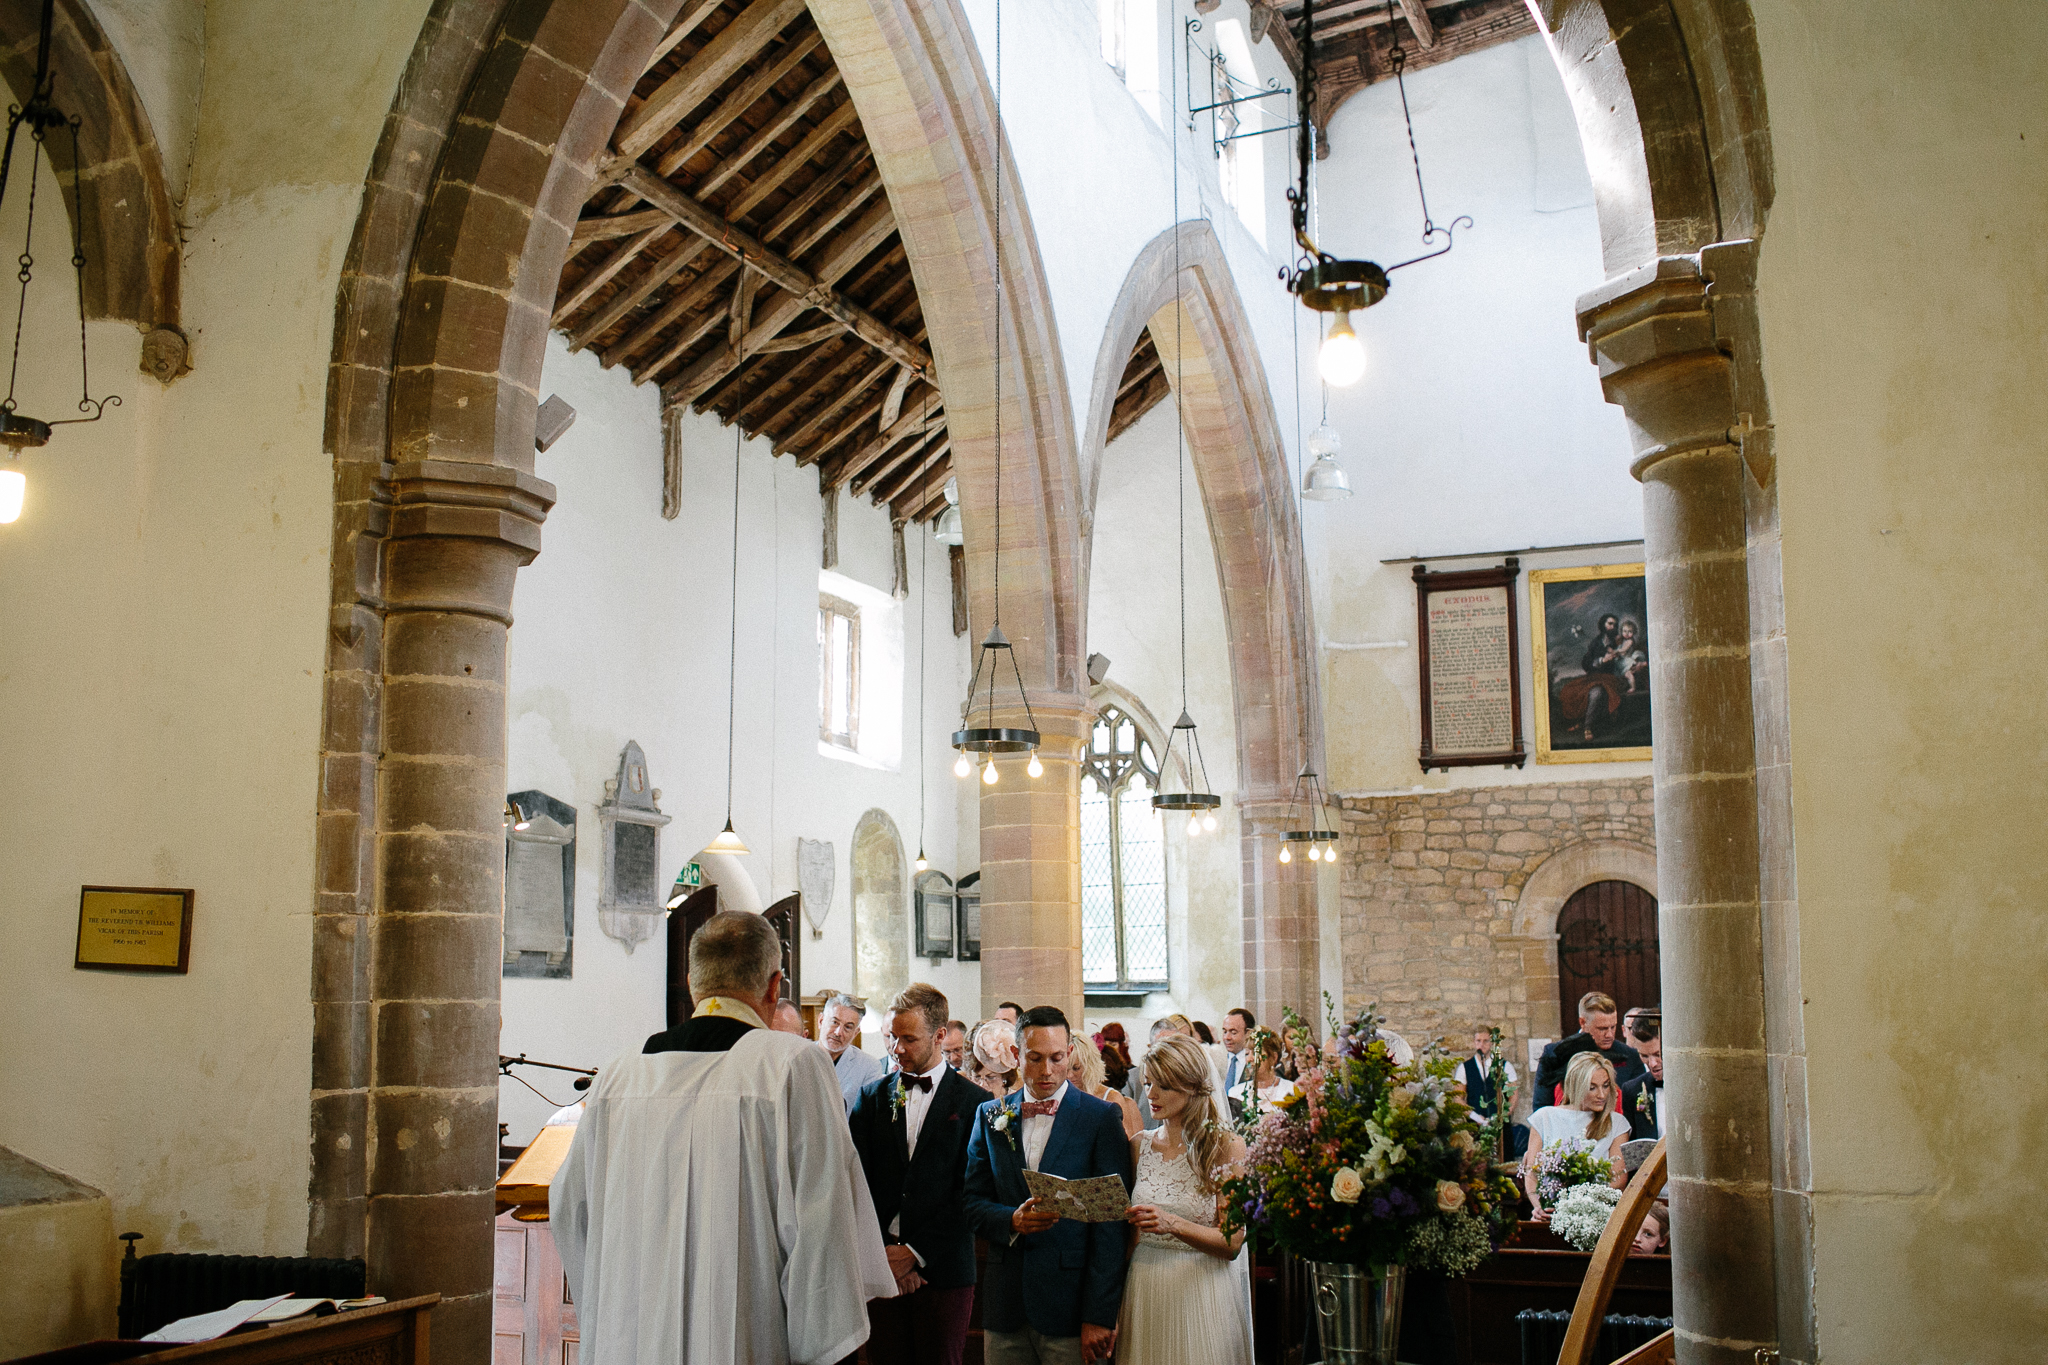 grantham_wedding_photographer-46.jpg